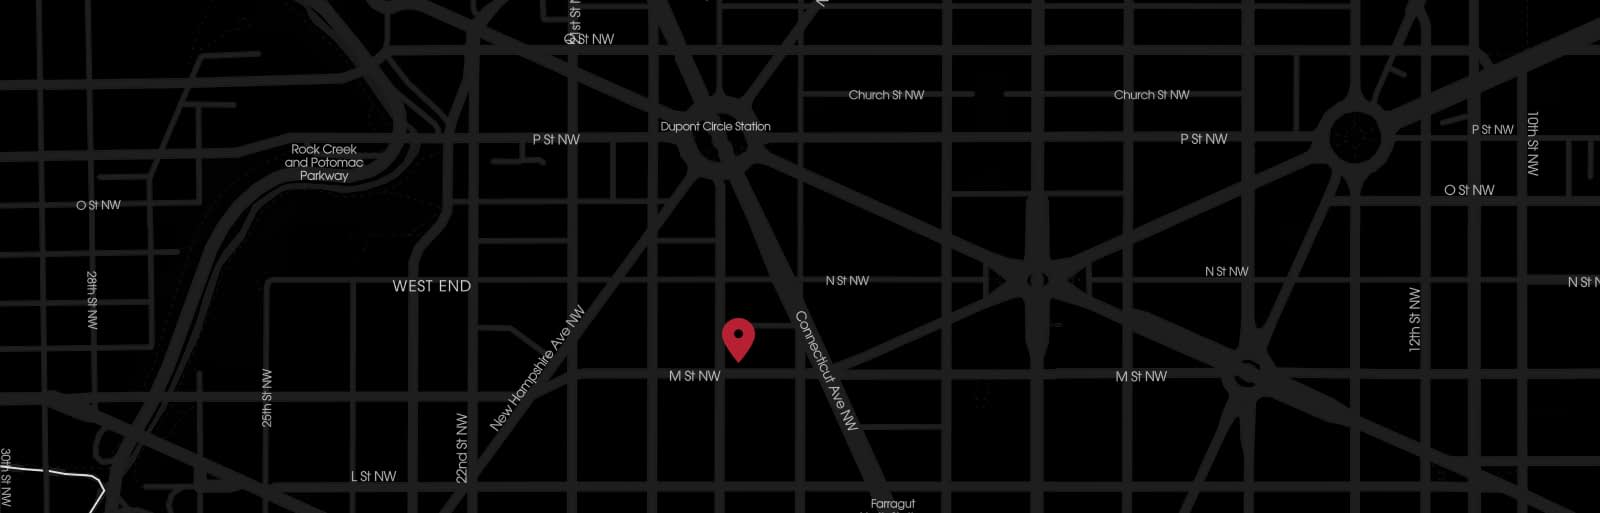 Spanish Tapas Bar & Restaurant Located in NYC and DC | Boqueria